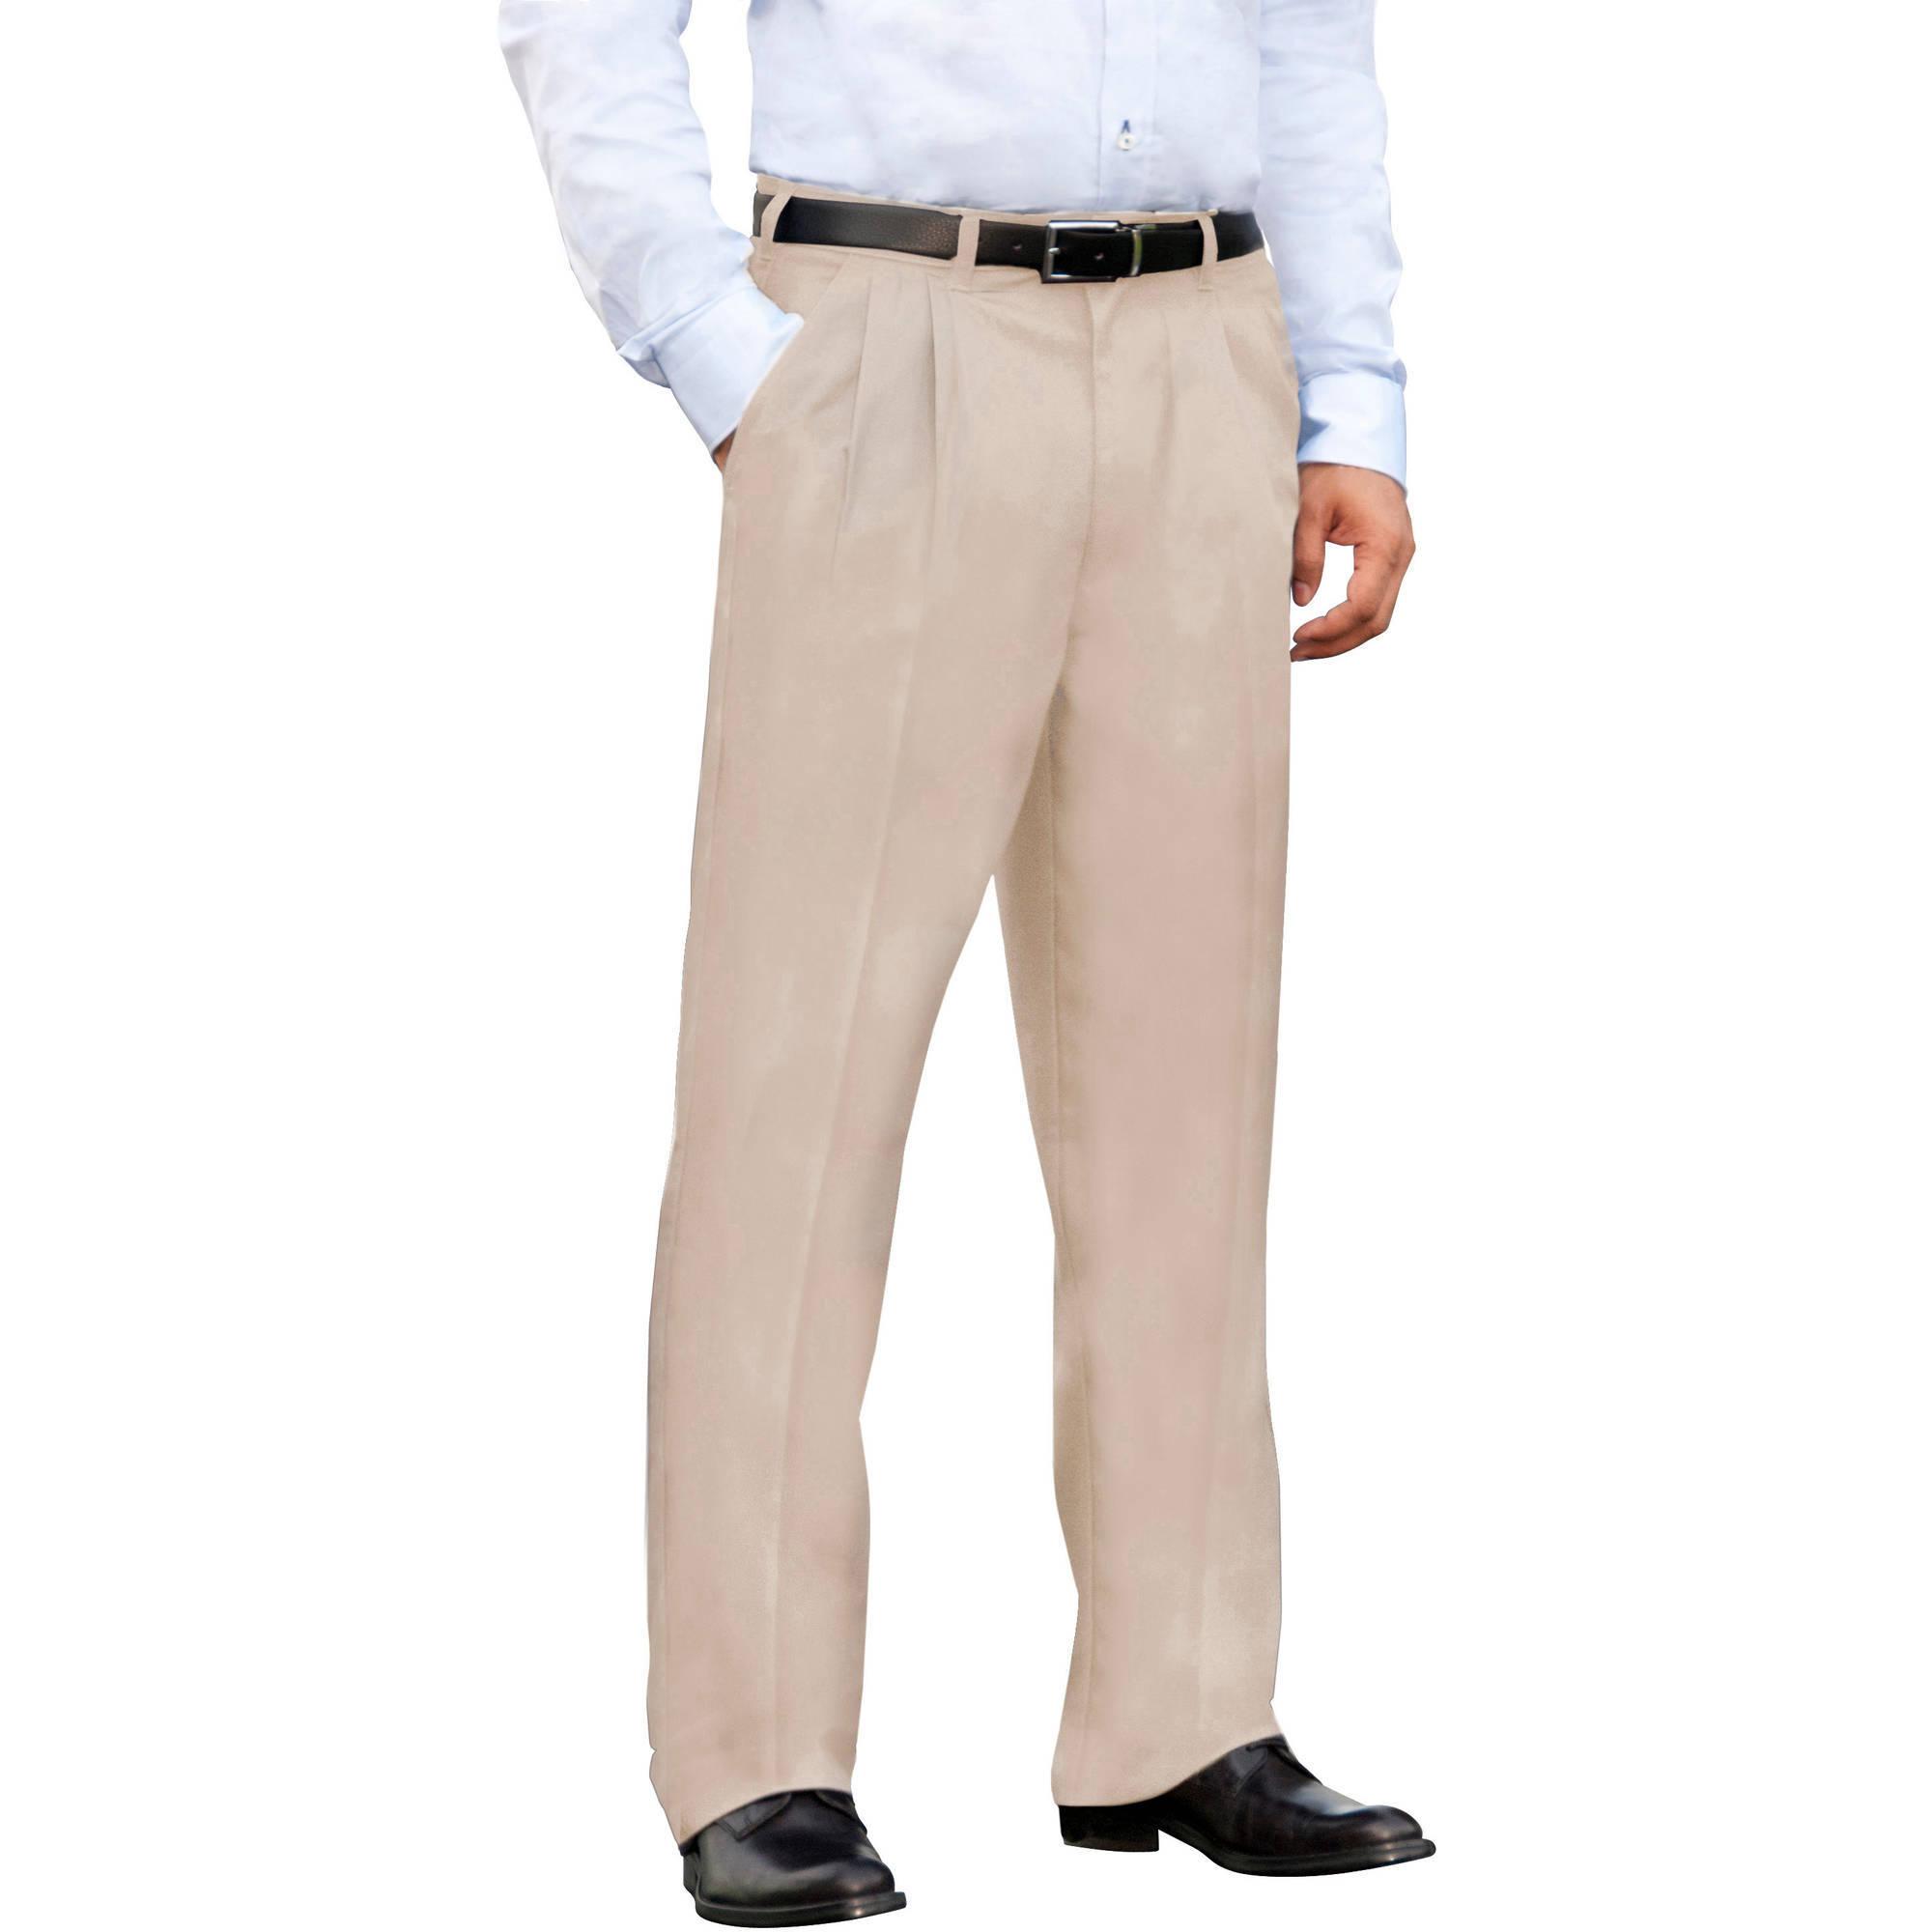 George - Big Men's Wrinkle-Resistant Pleat-Front Khaki Pants